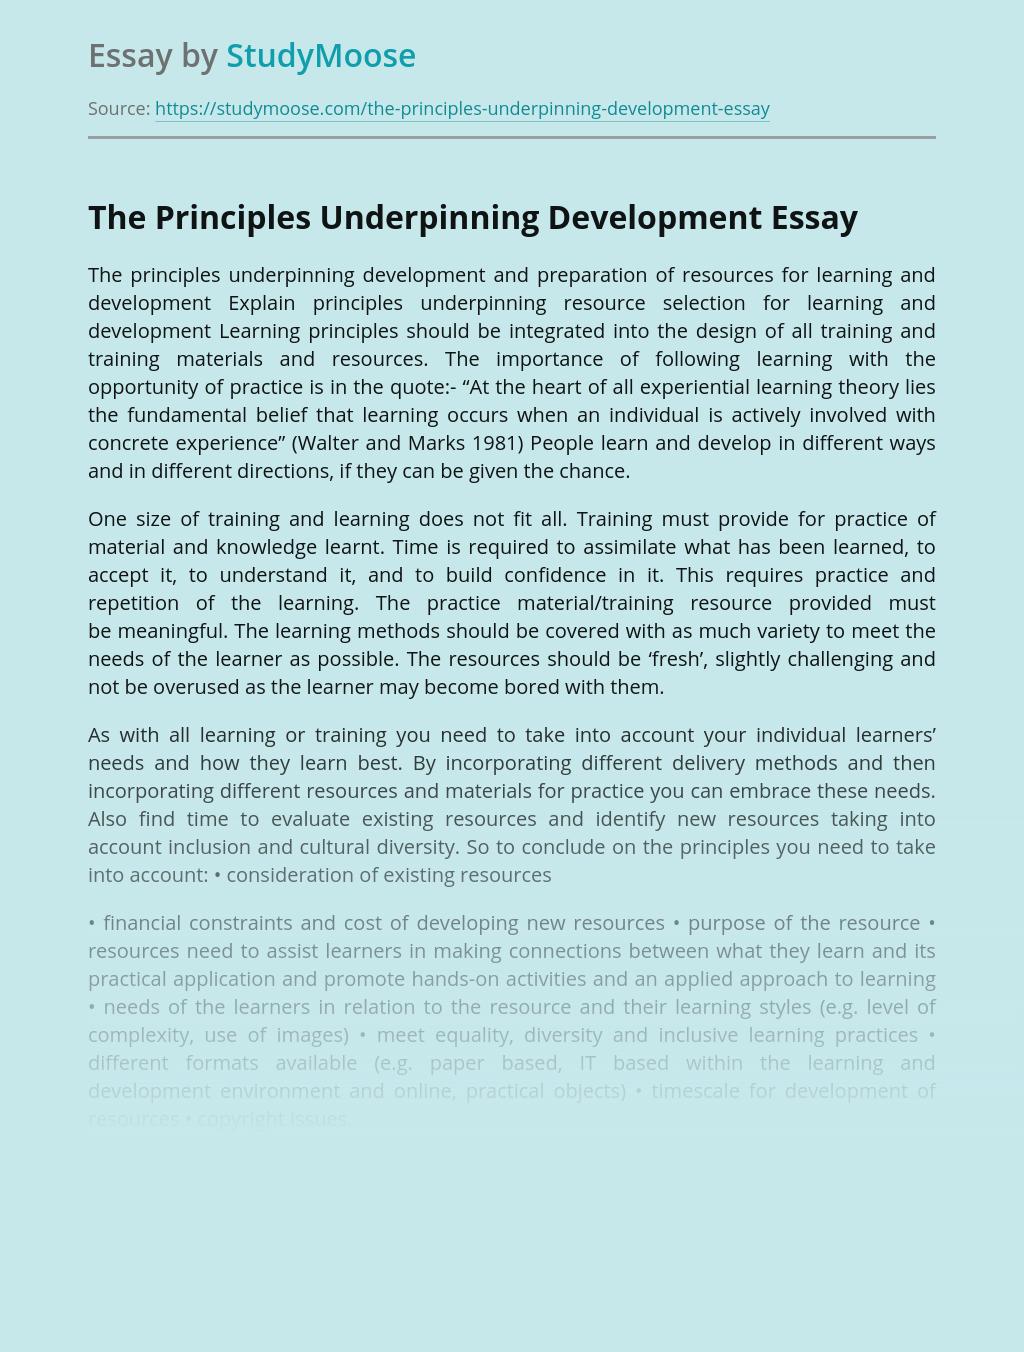 The Principles Underpinning Development